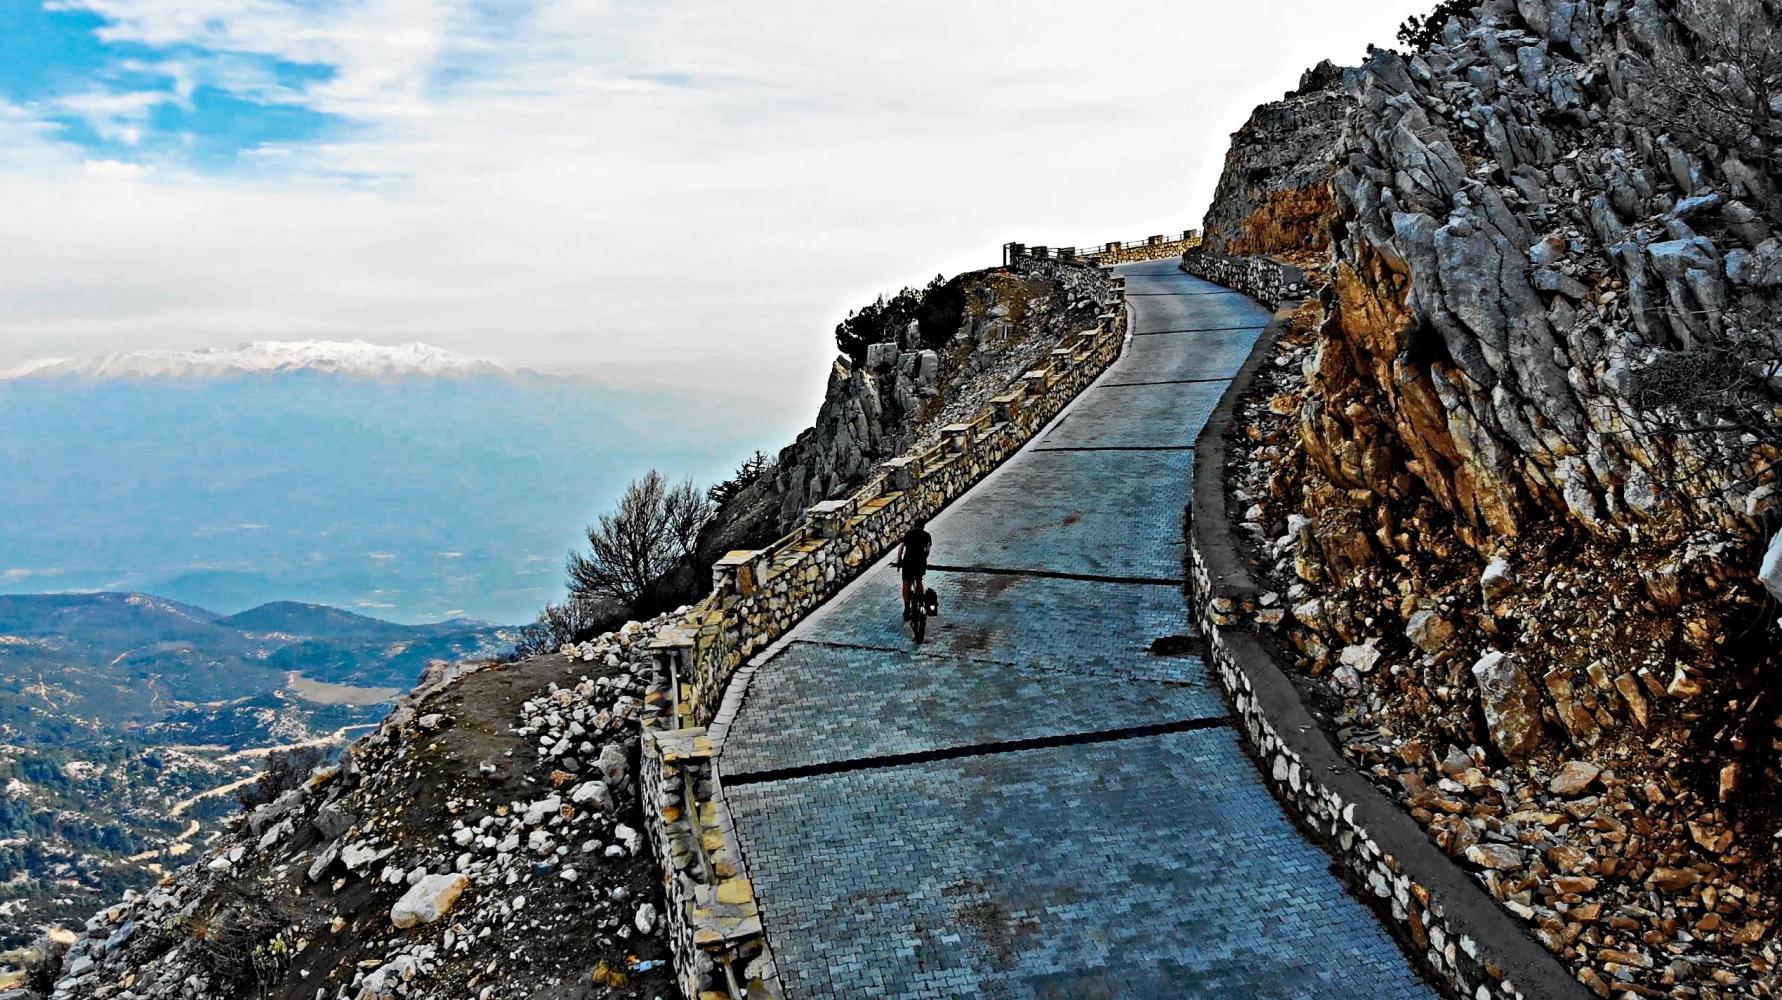 Cycling Climb - Mount Babadag - Turkey, Muğla